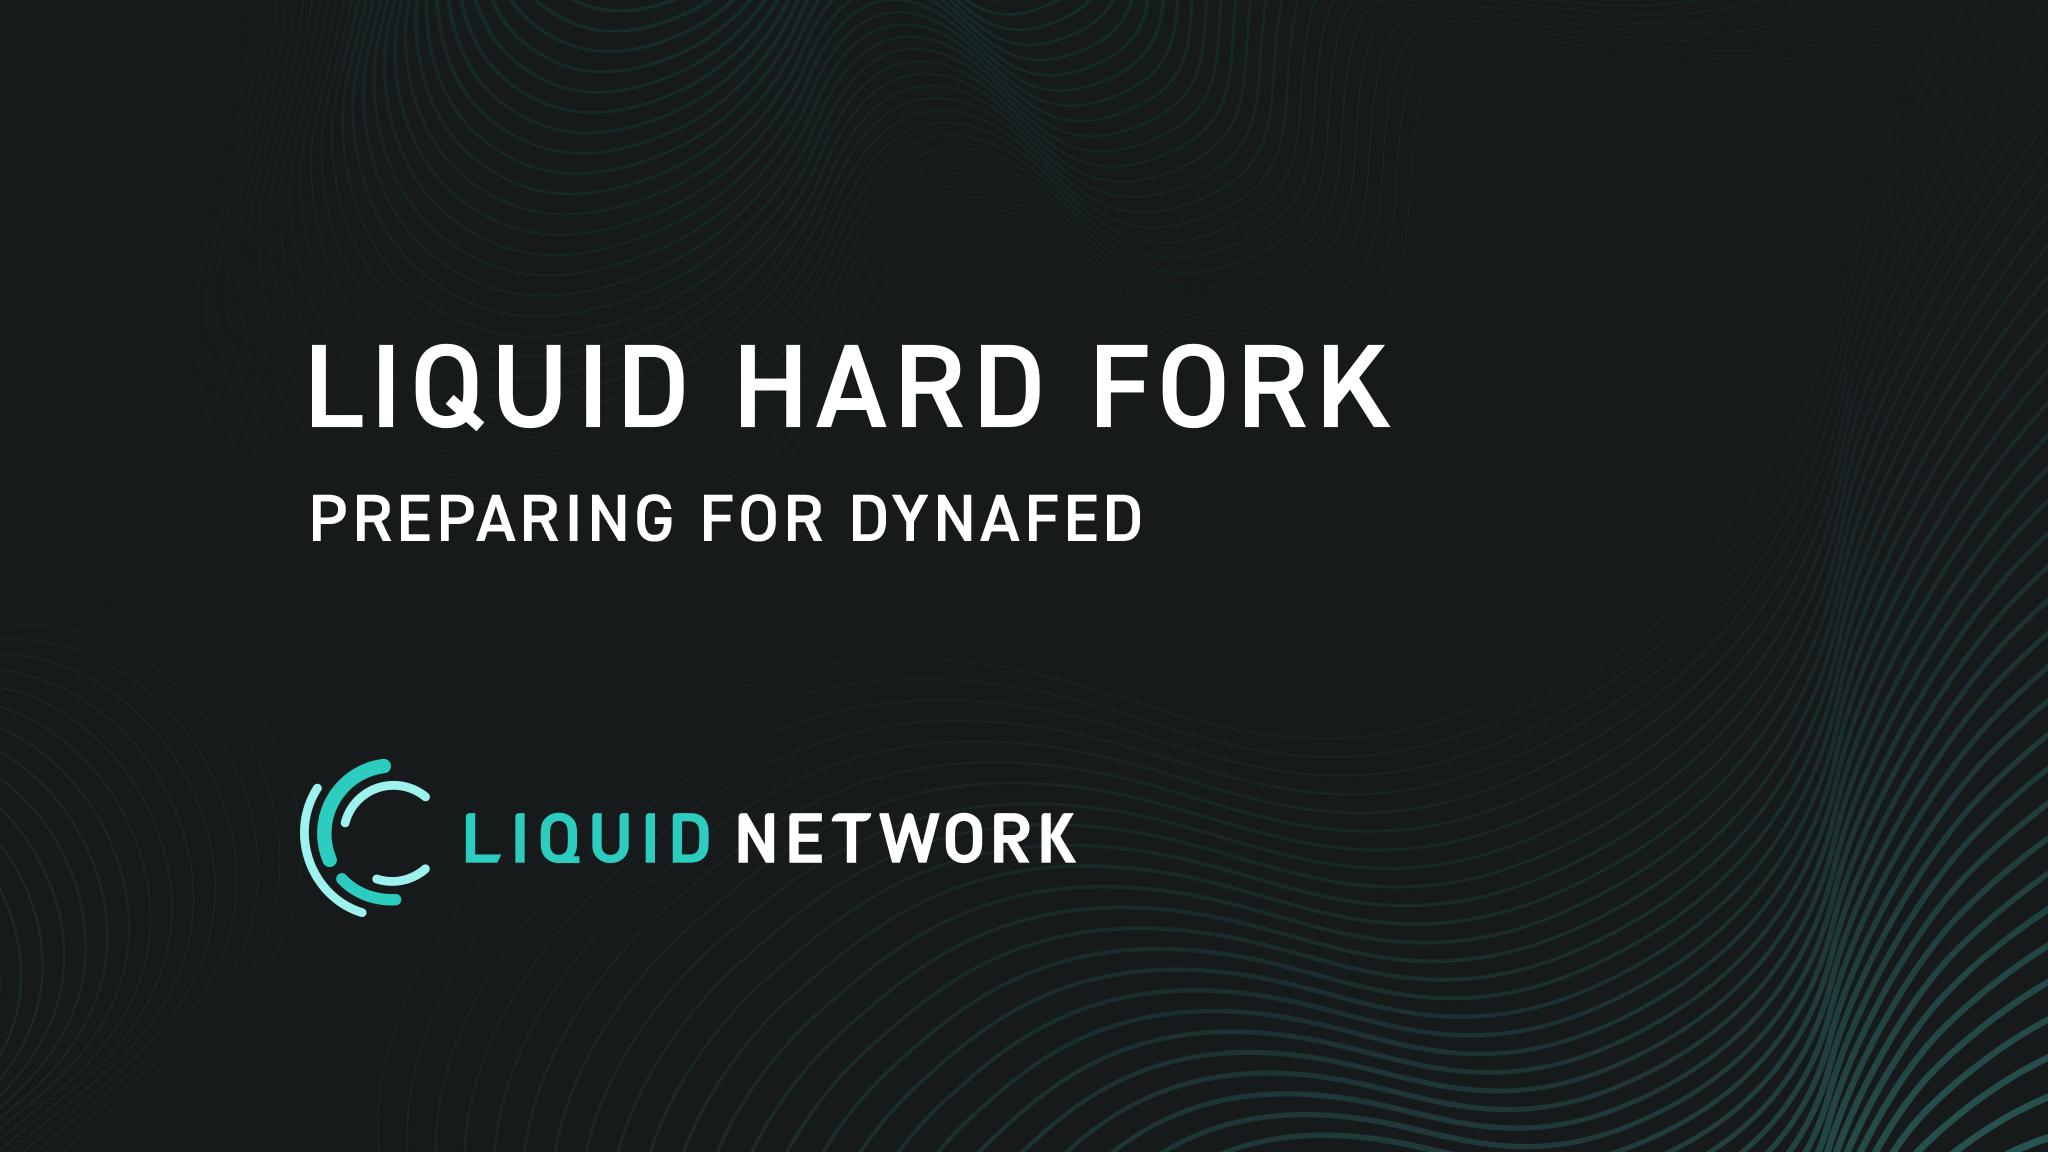 Preparing the Liquid Network for Dynamic Federations